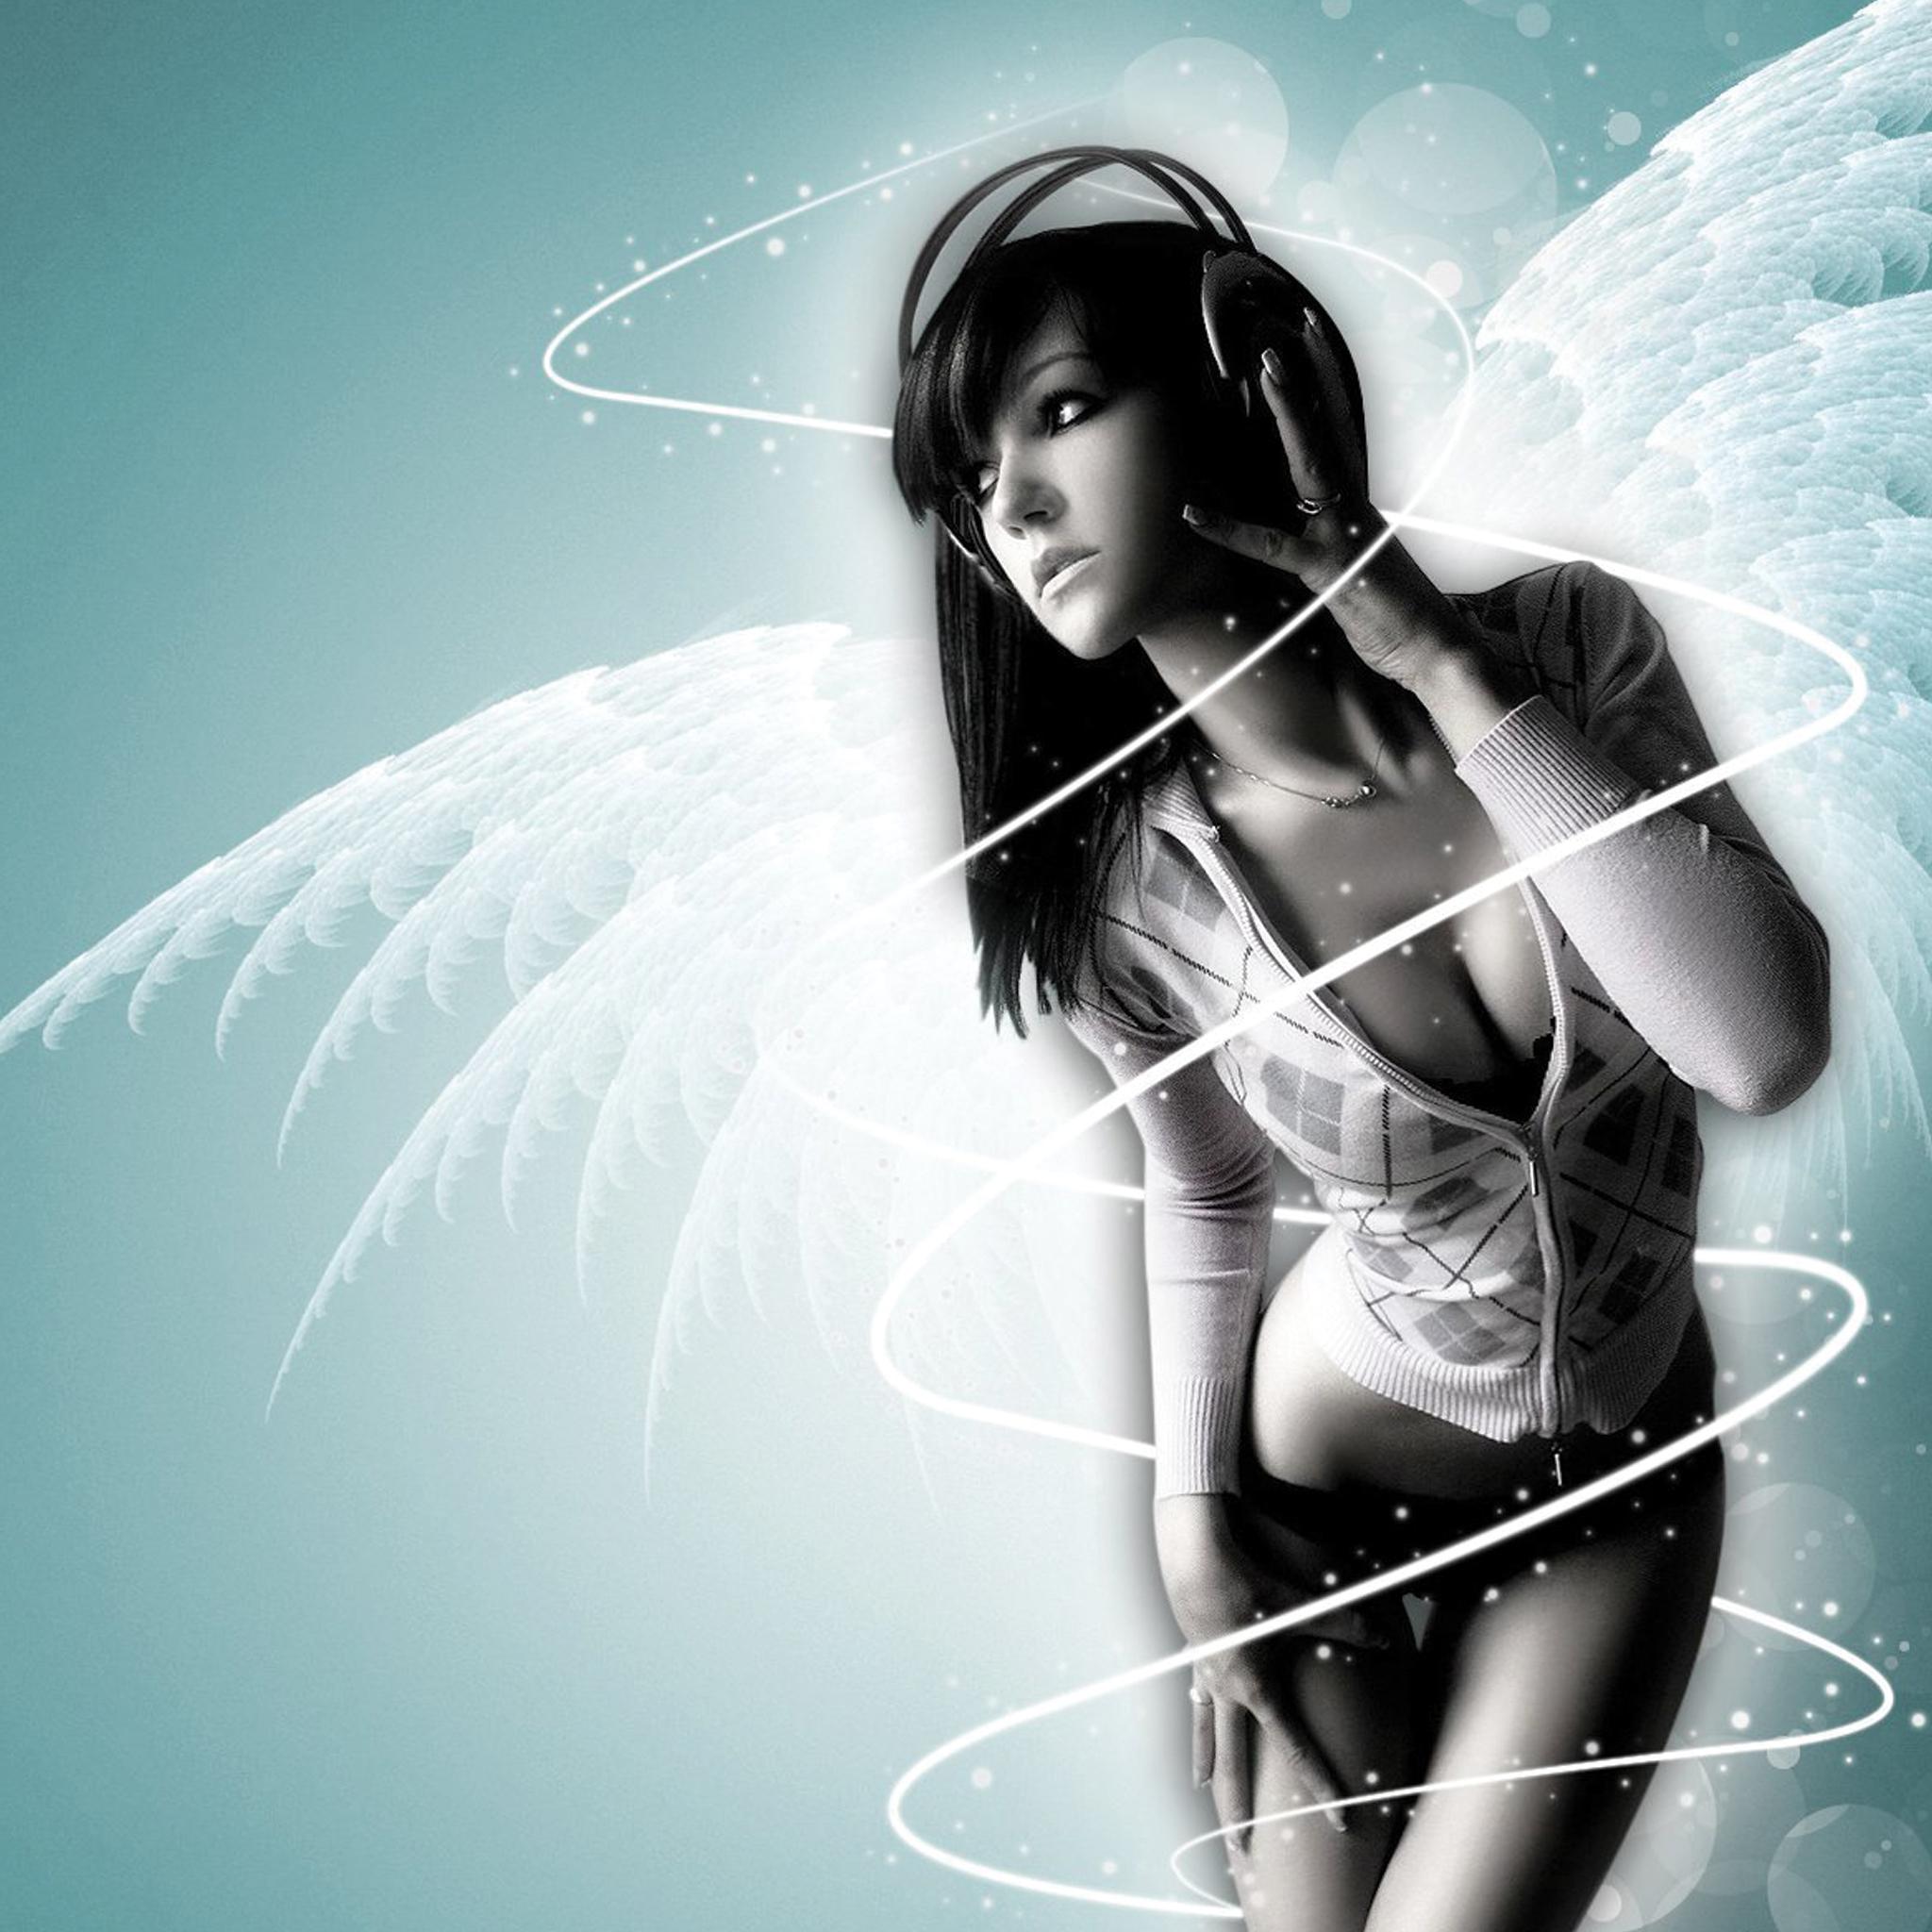 Angel Girl Music 3Wallpapers iPad Retina Angel Girl Music   iPad Retina